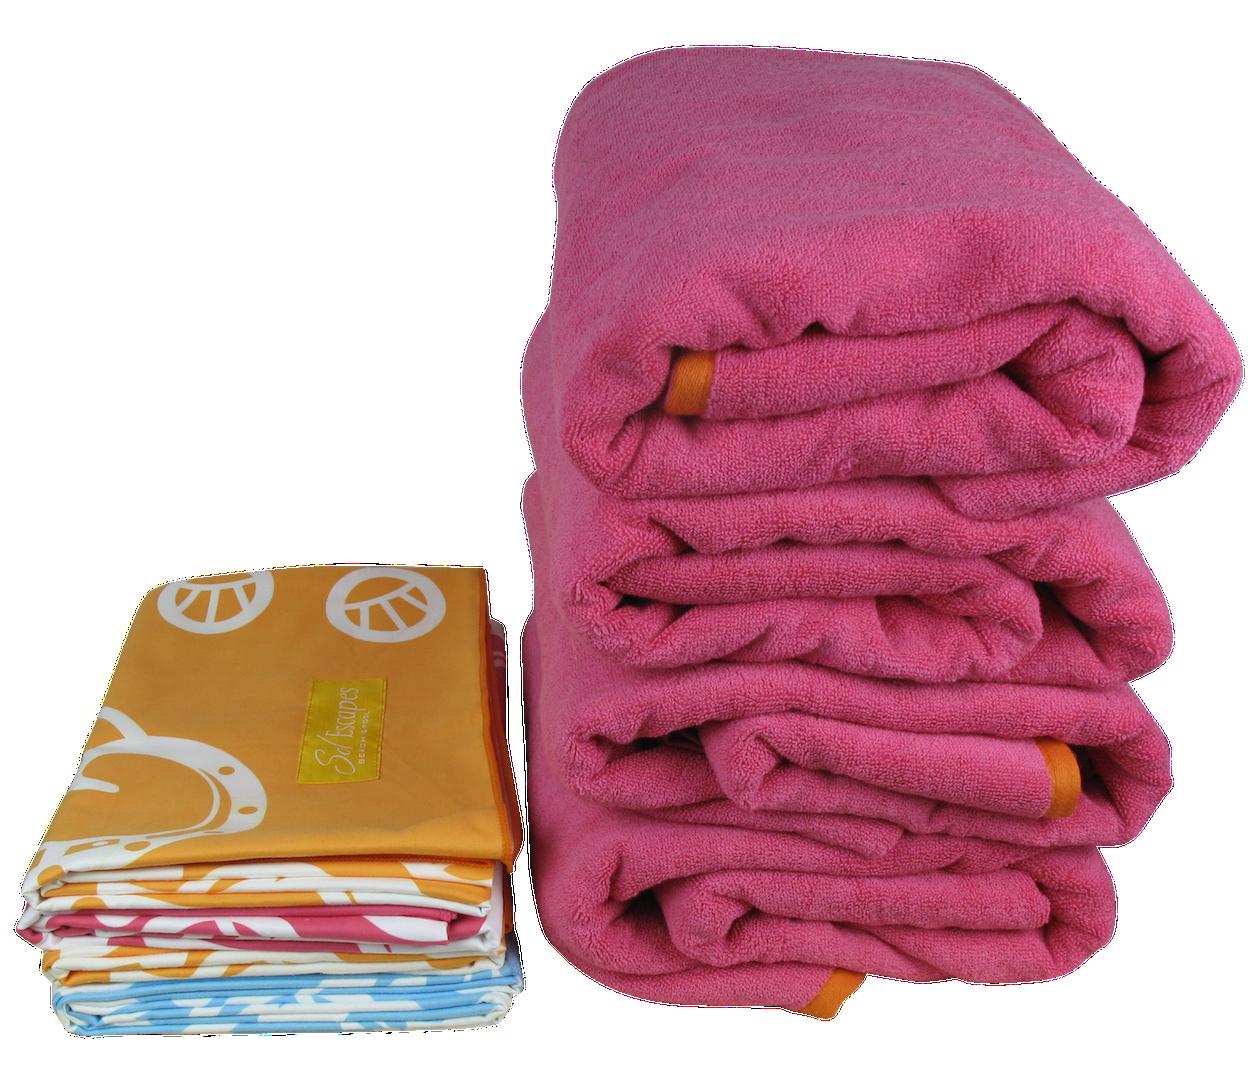 Towel Interstellar Travel: SolEscapes' Travel Lux Beach & Pool Microfiber Towels